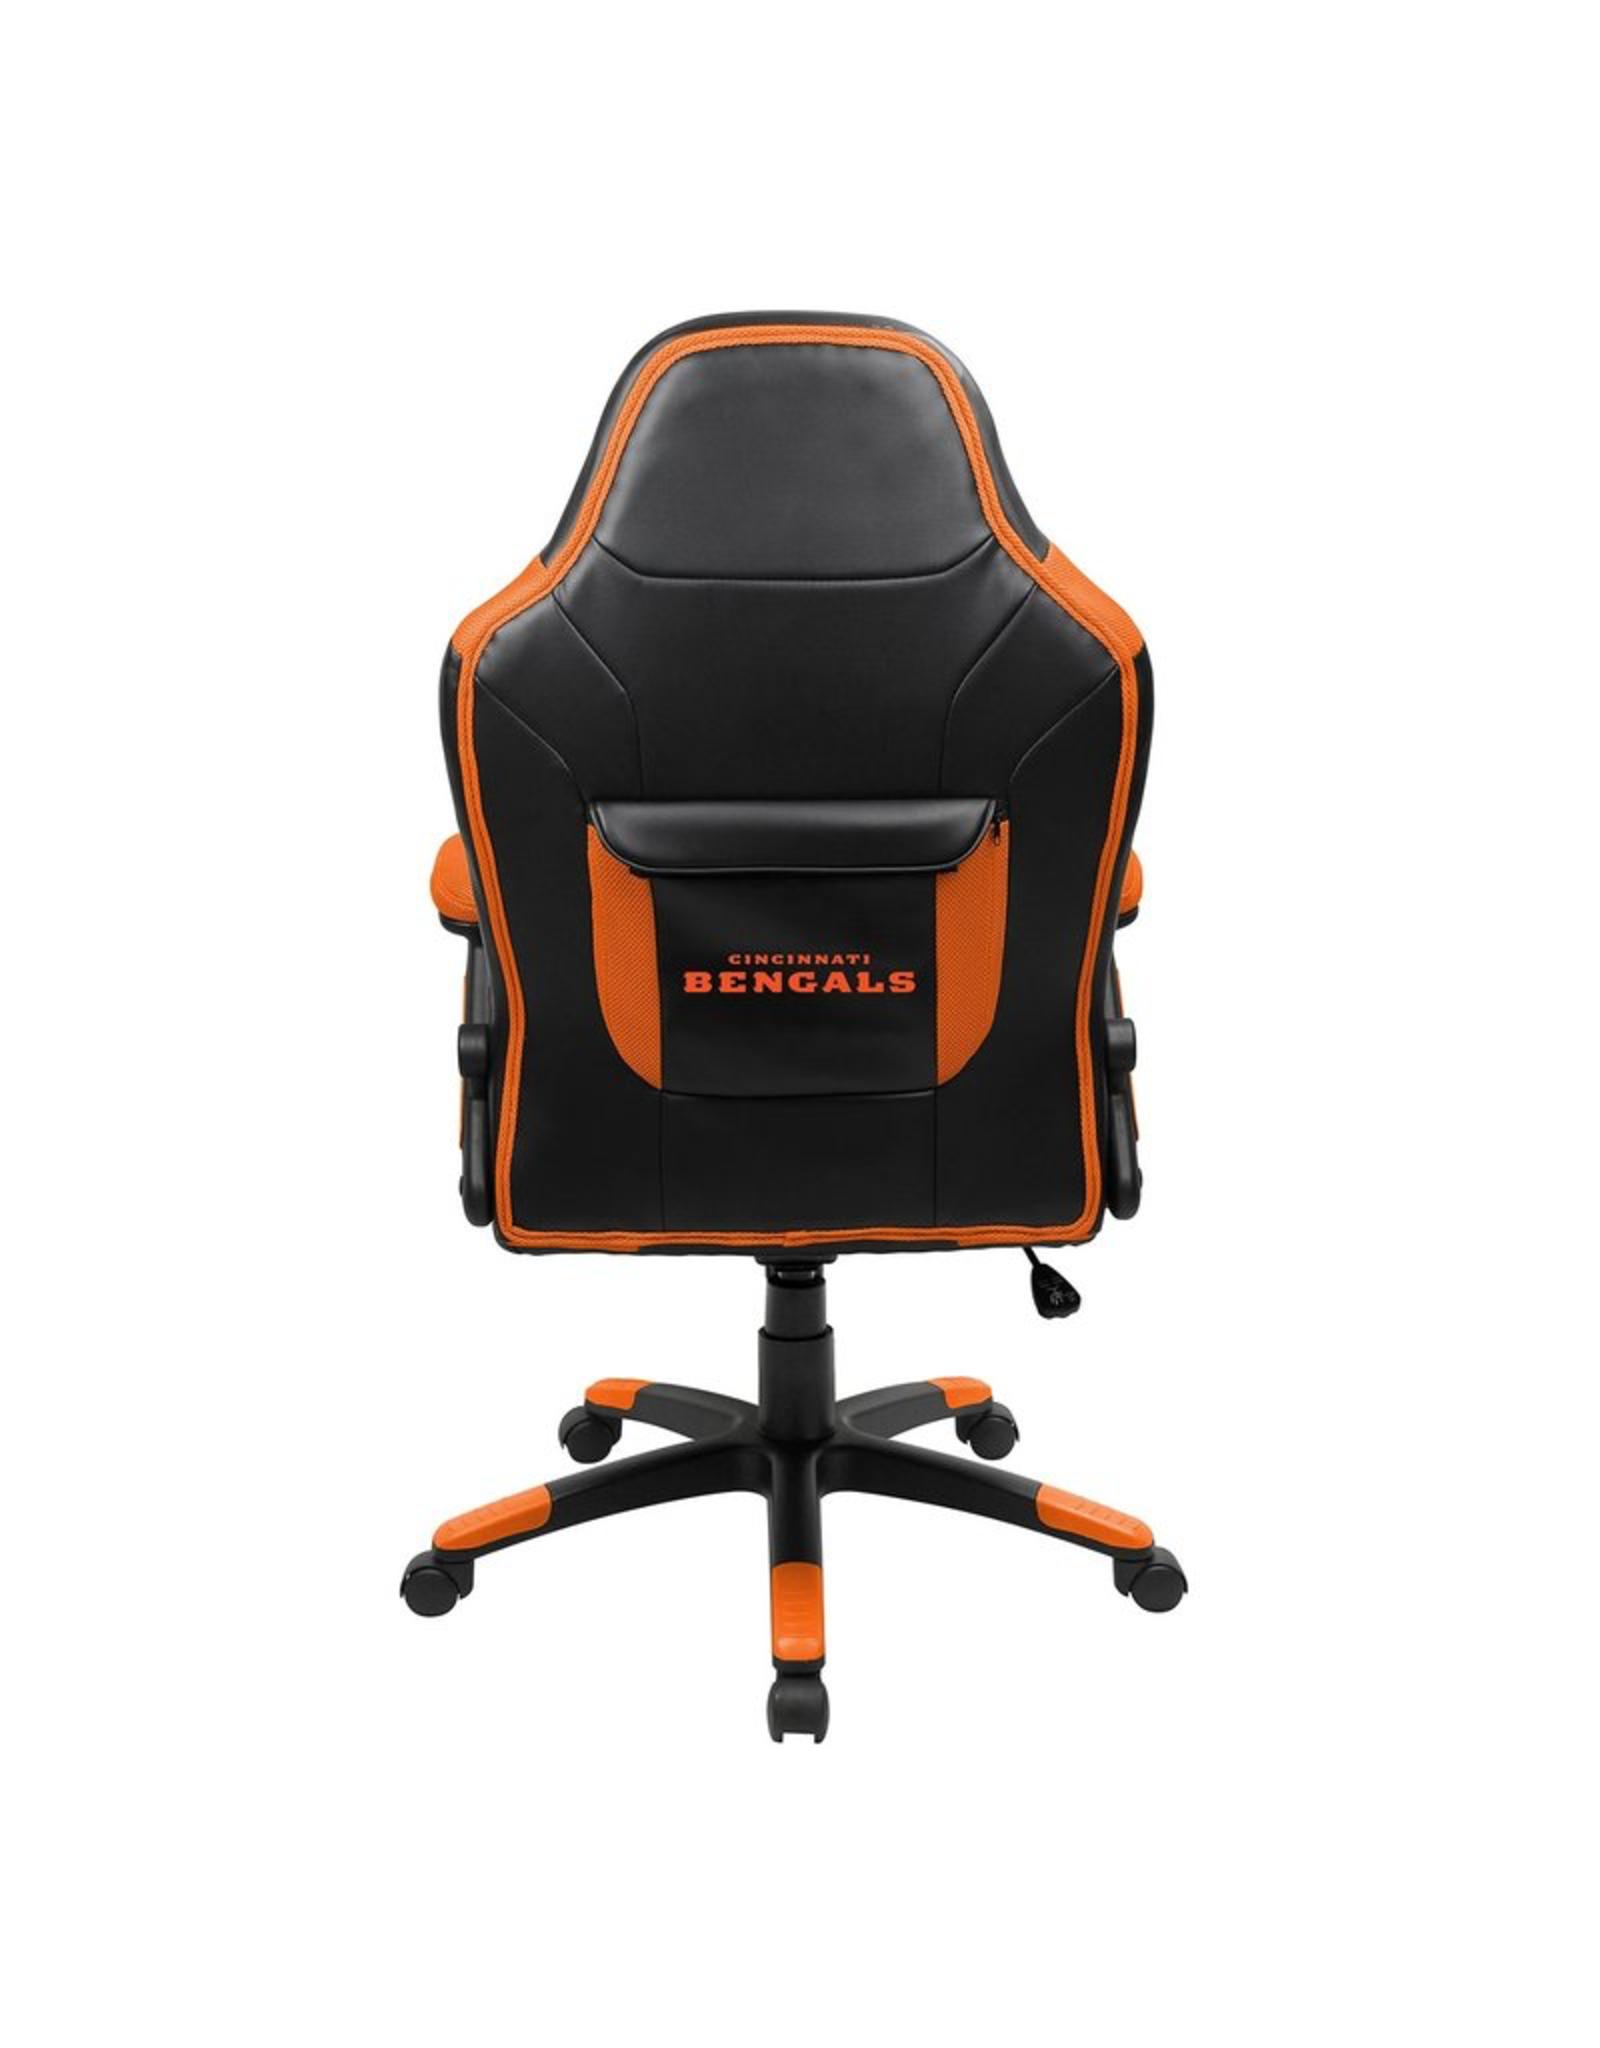 IMPERIAL Cincinnati Bengals Oversized Gaming/Office Chair